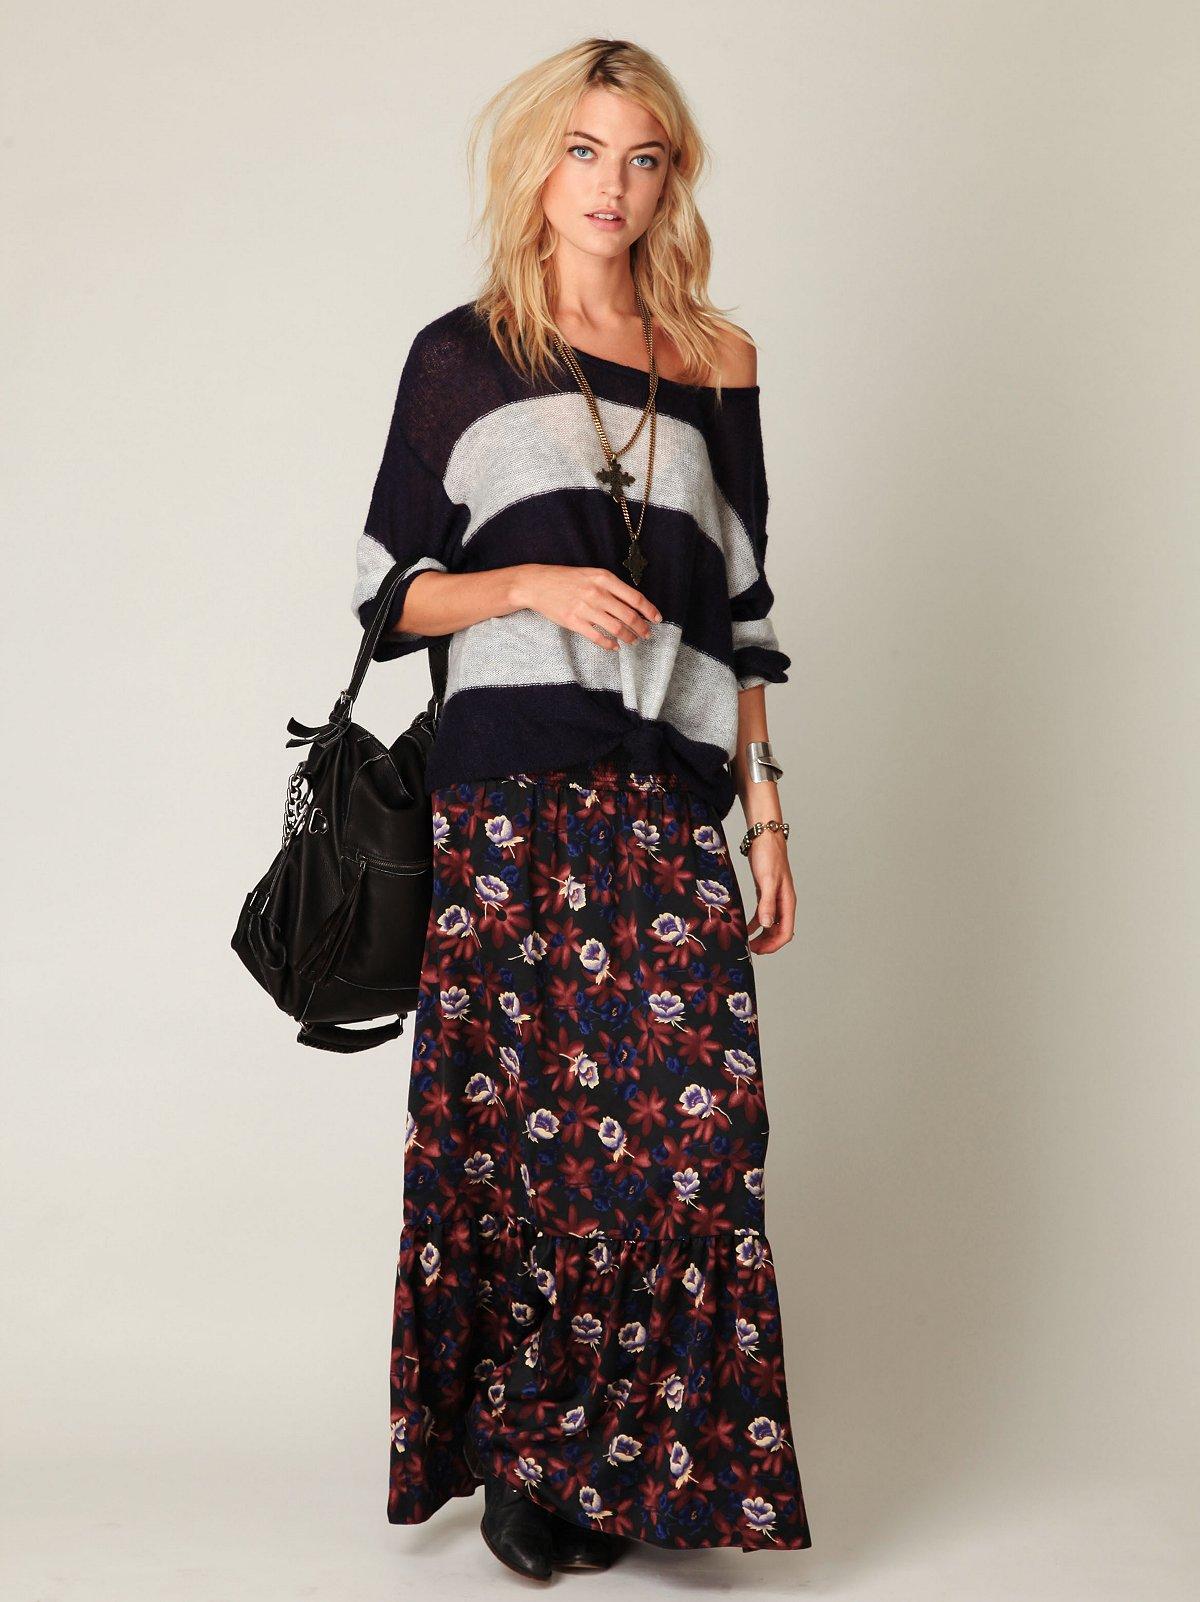 Gypsy Lover Maxi Skirt